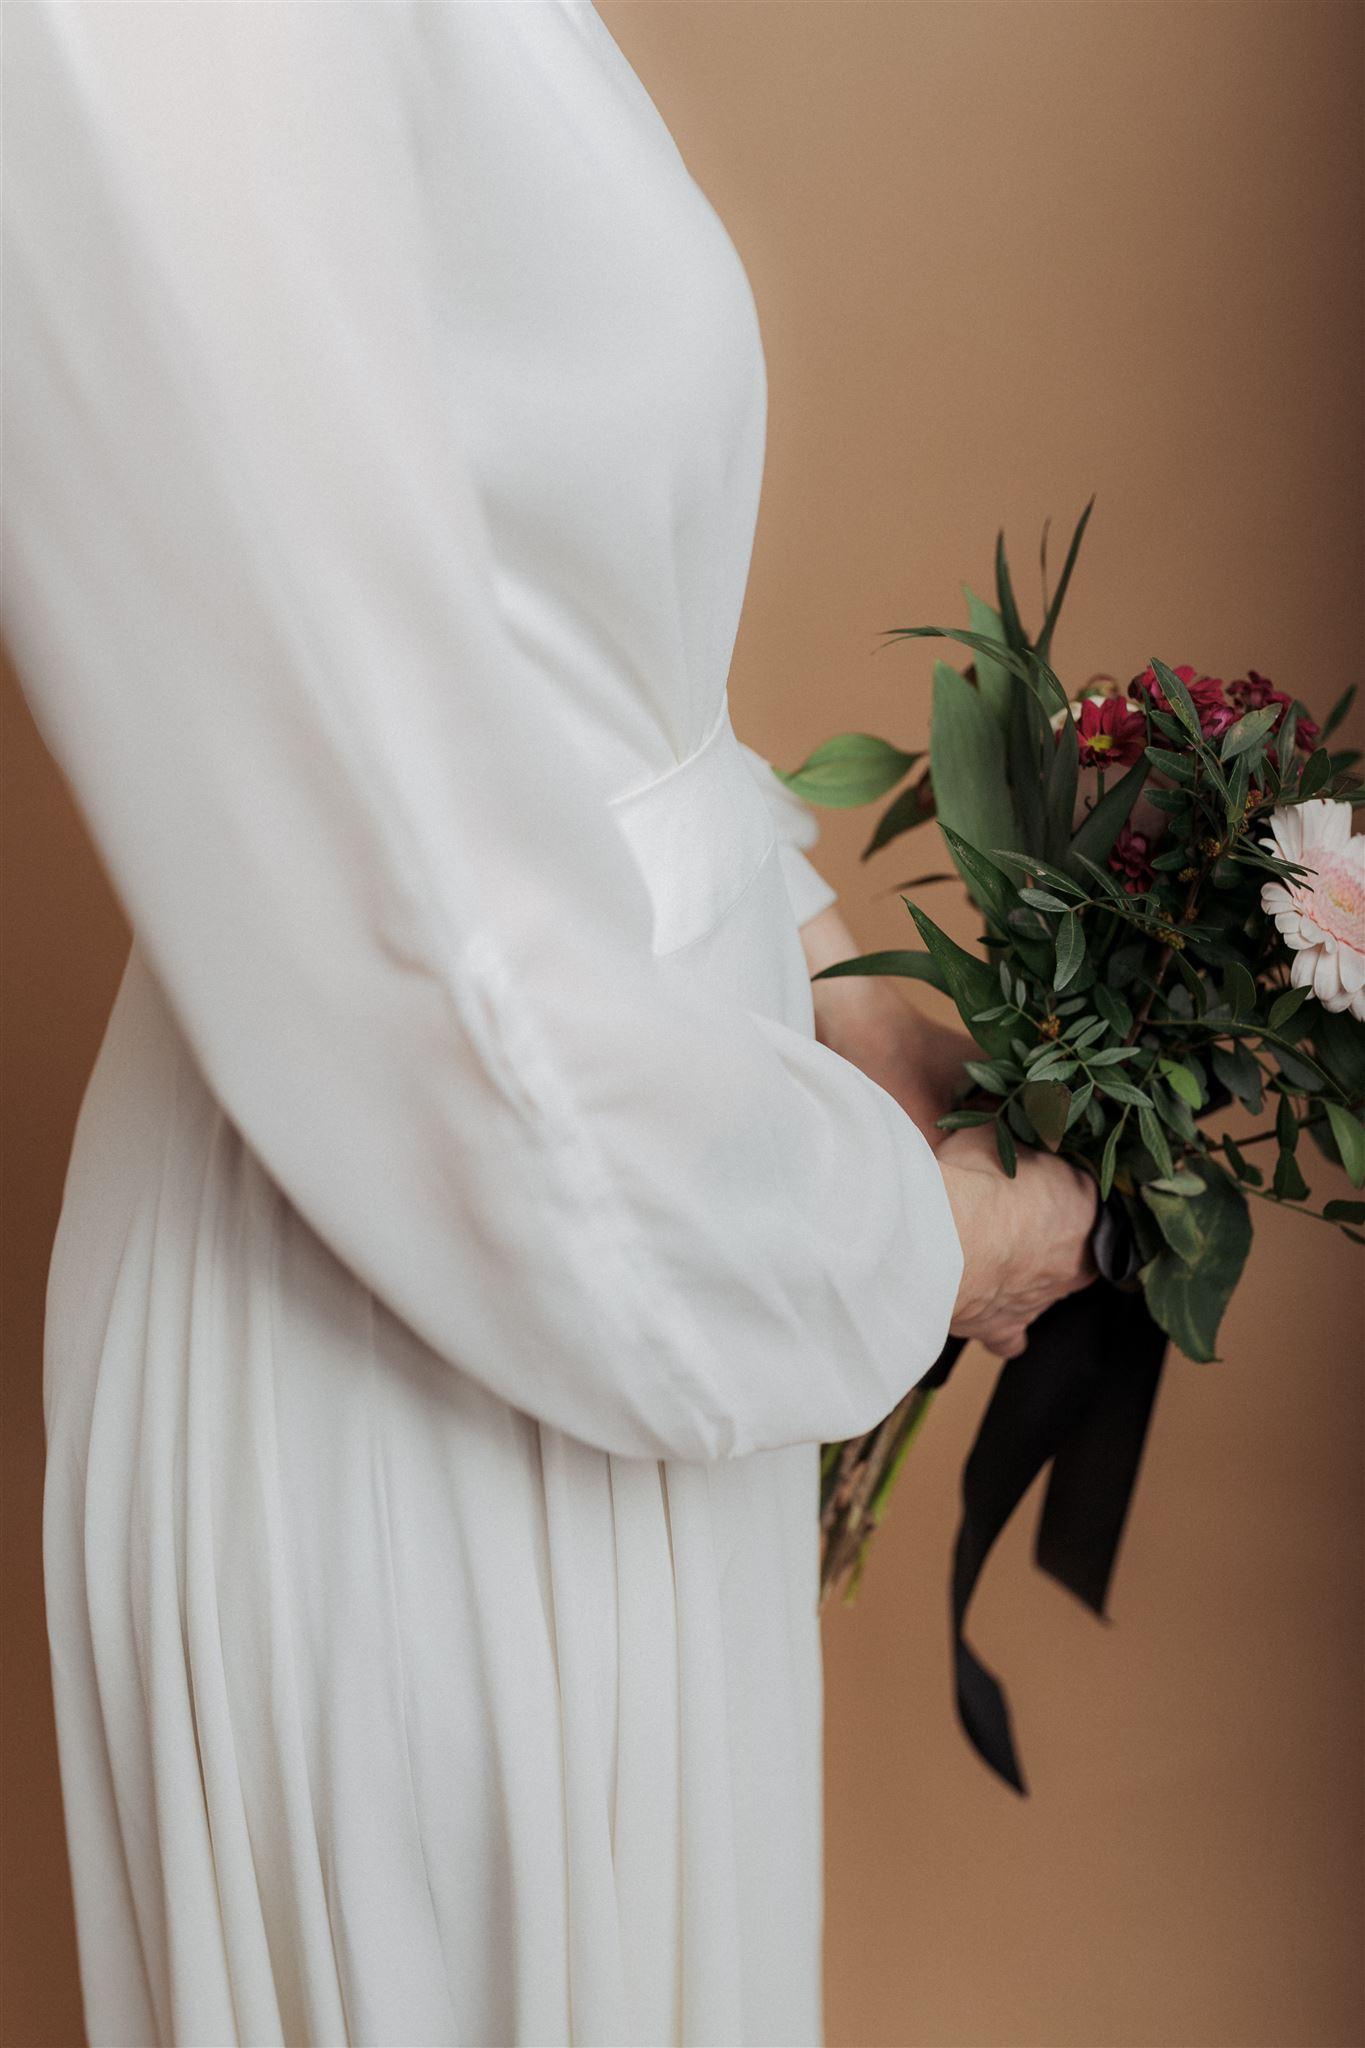 Braut mit Brautstrauß im Fotostudio